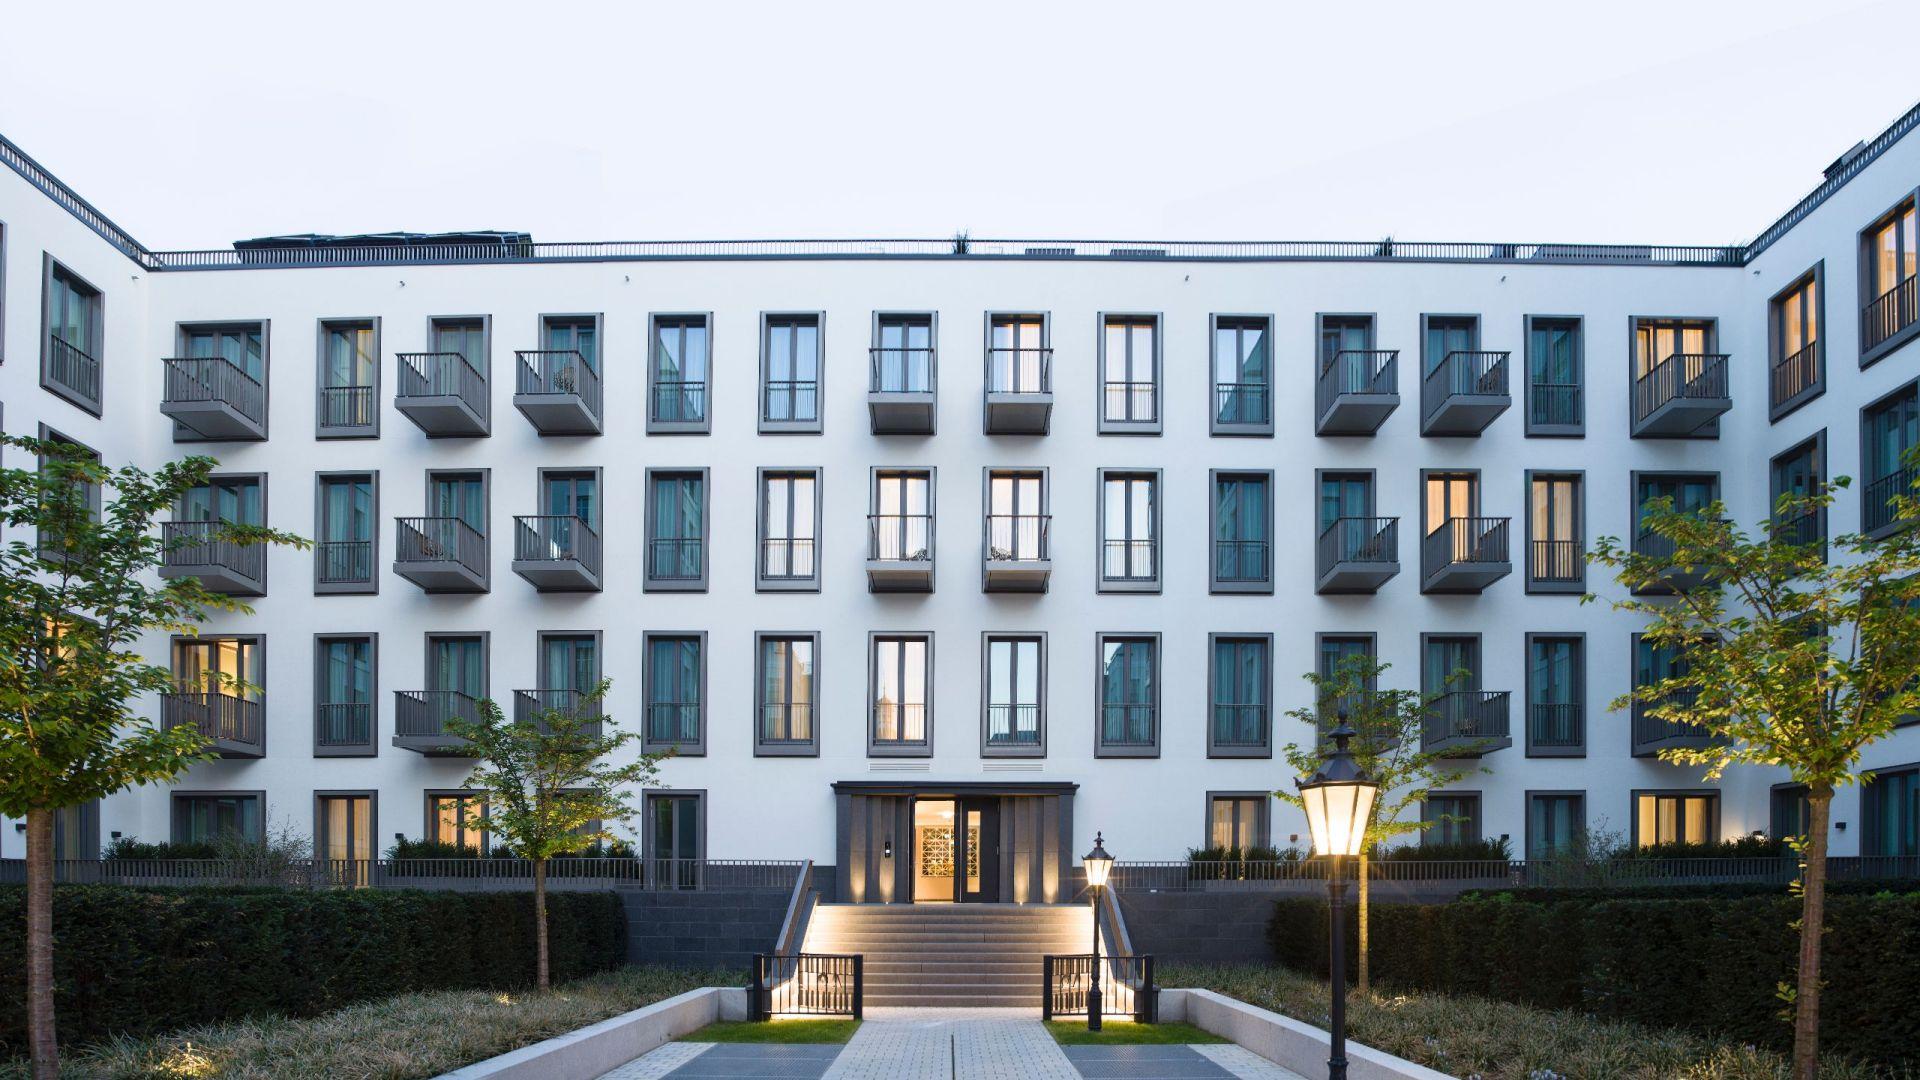 Hyatt House Dusseldorf Exterior